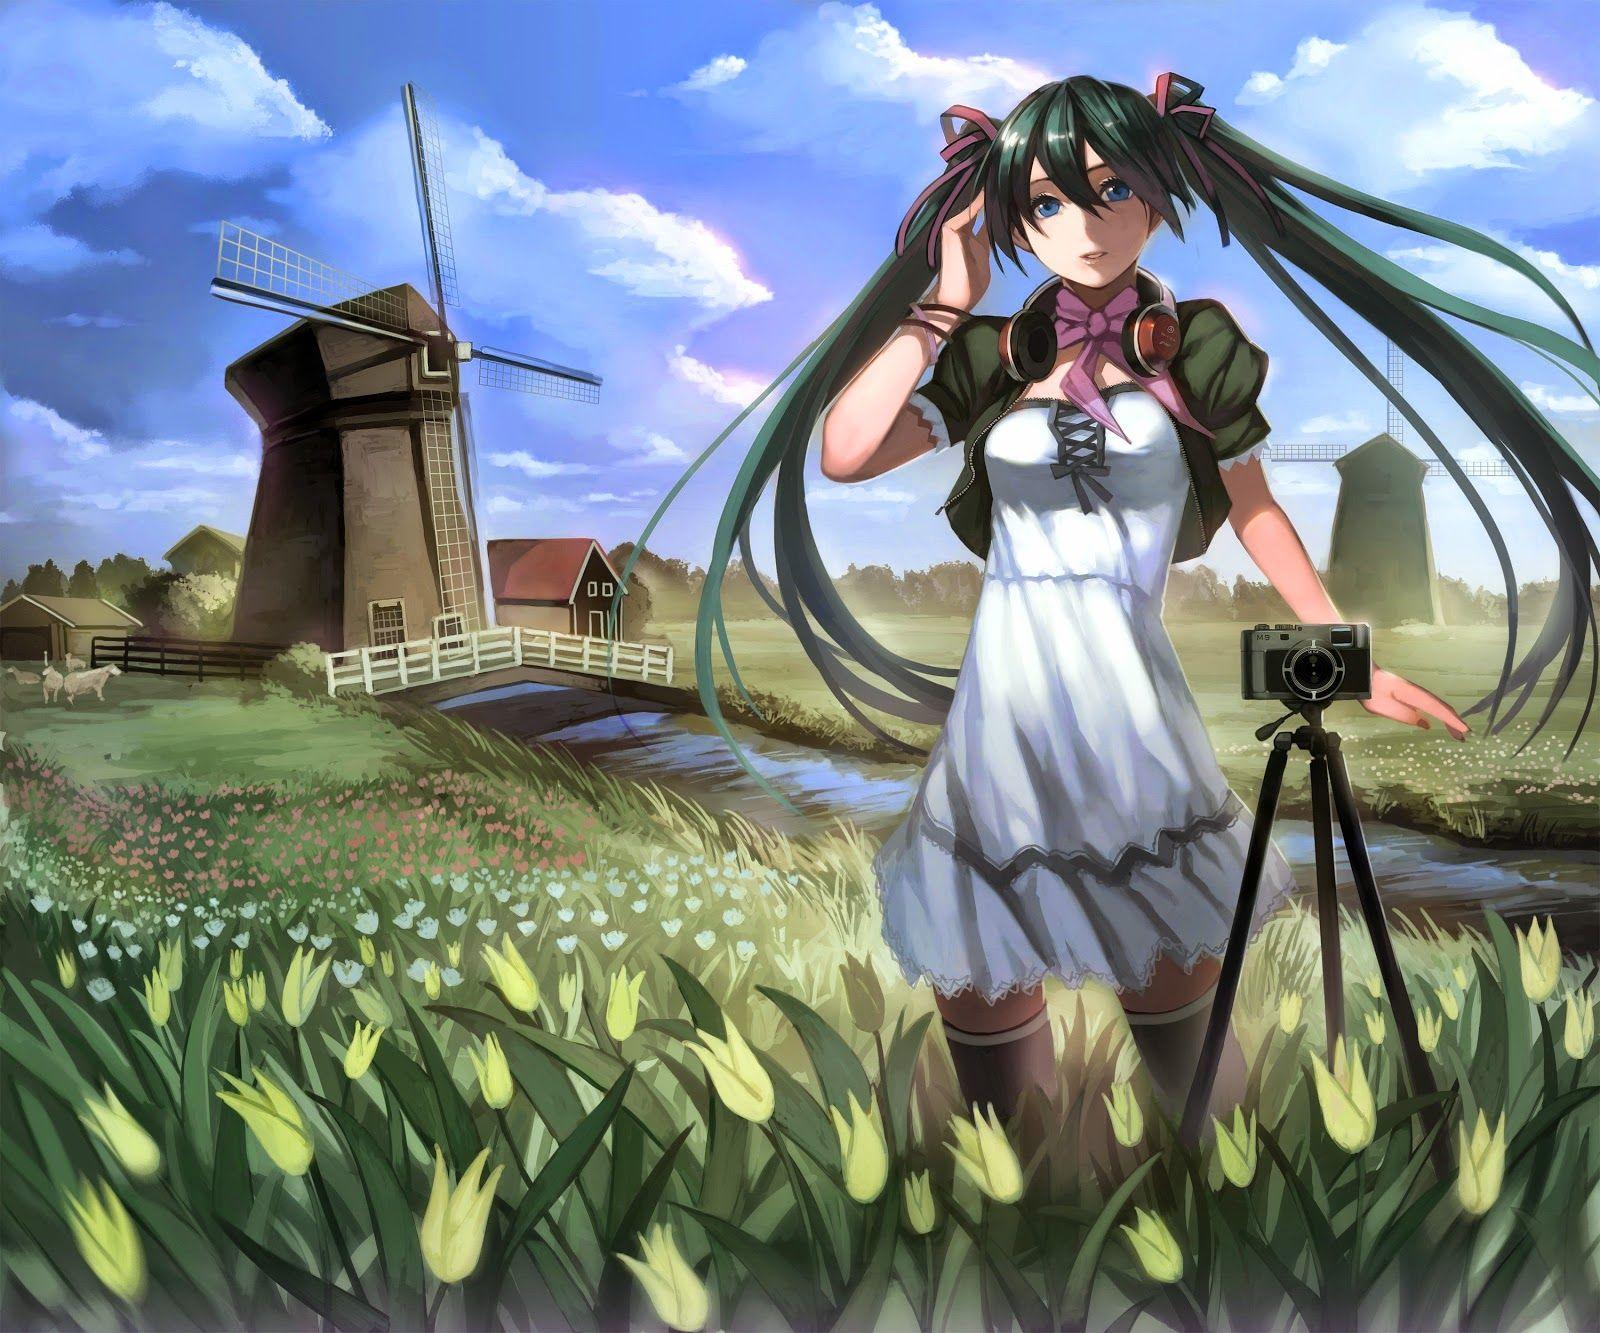 Anime ภาพพ นหล ง Anime การ ต น สวยๆ Anime Wallpaper Live ภาพพ นหล ง การ ต น พ นหล ง